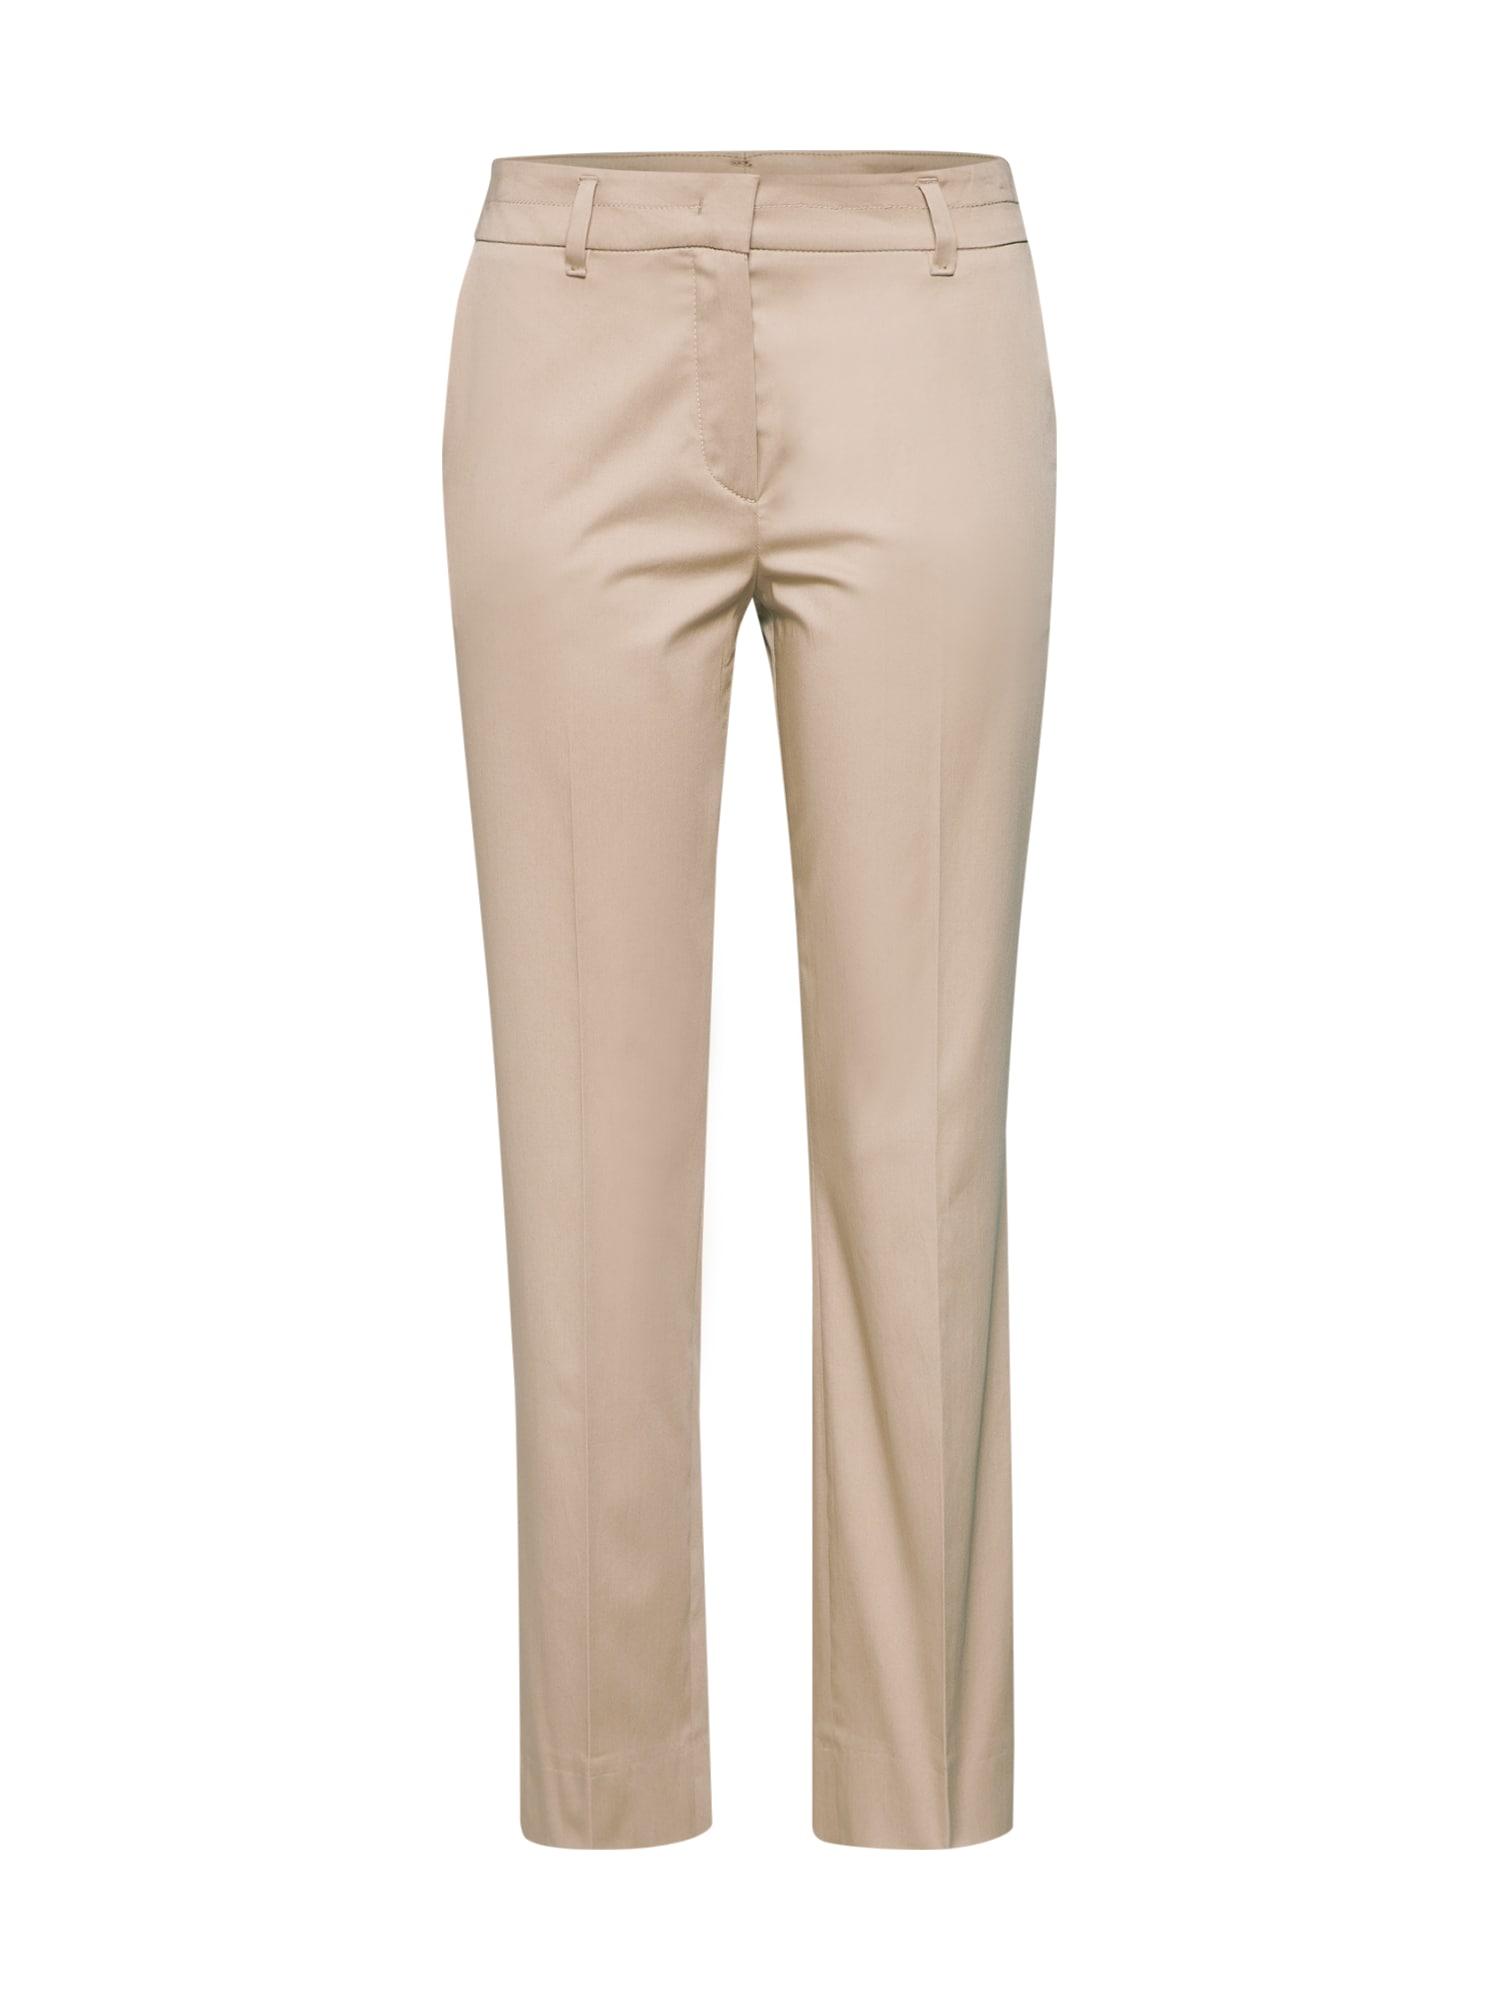 Chino kalhoty F077A béžová RENÉ LEZARD